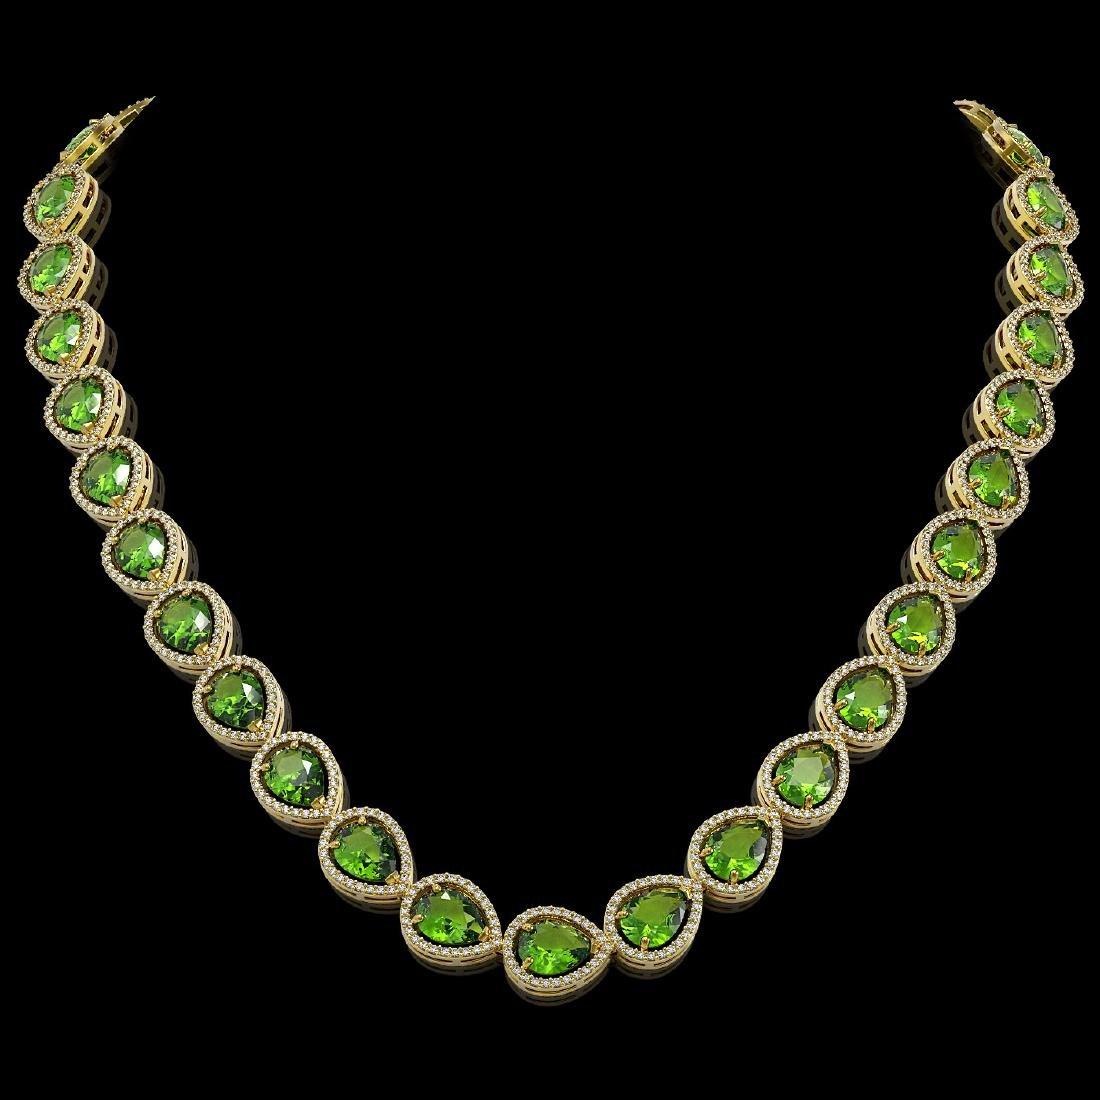 33.6 CTW Peridot & Diamond Halo Necklace 10K Yellow